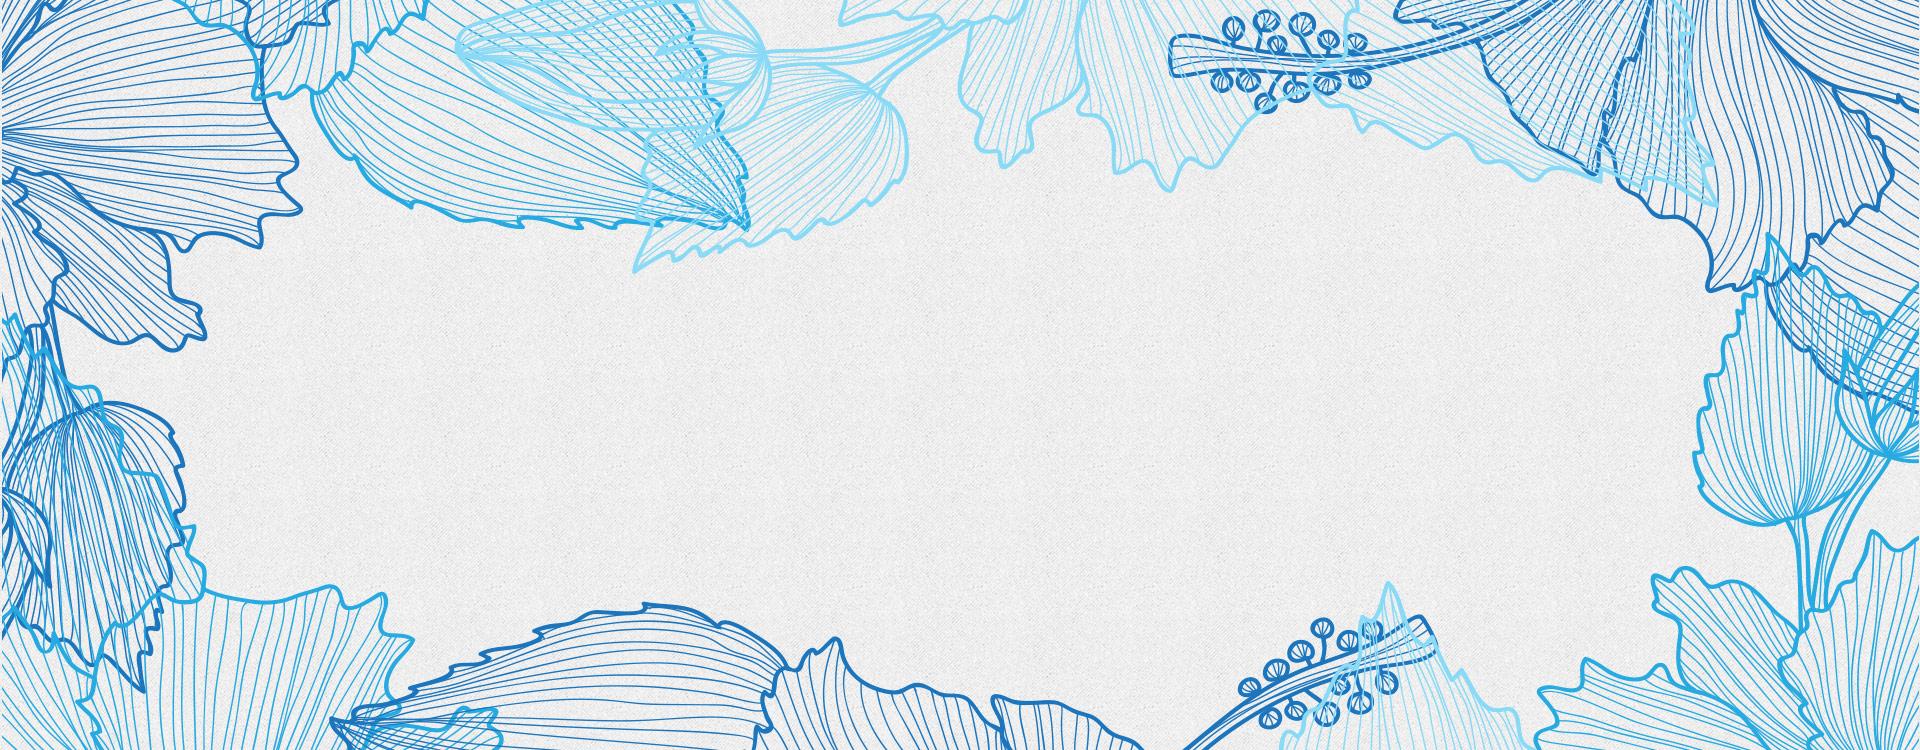 Diseño Patrón Arte Graphic Antecedentes Splash Fondos De: Floral Arte Patrón Diseño Antecedentes Splash Frame